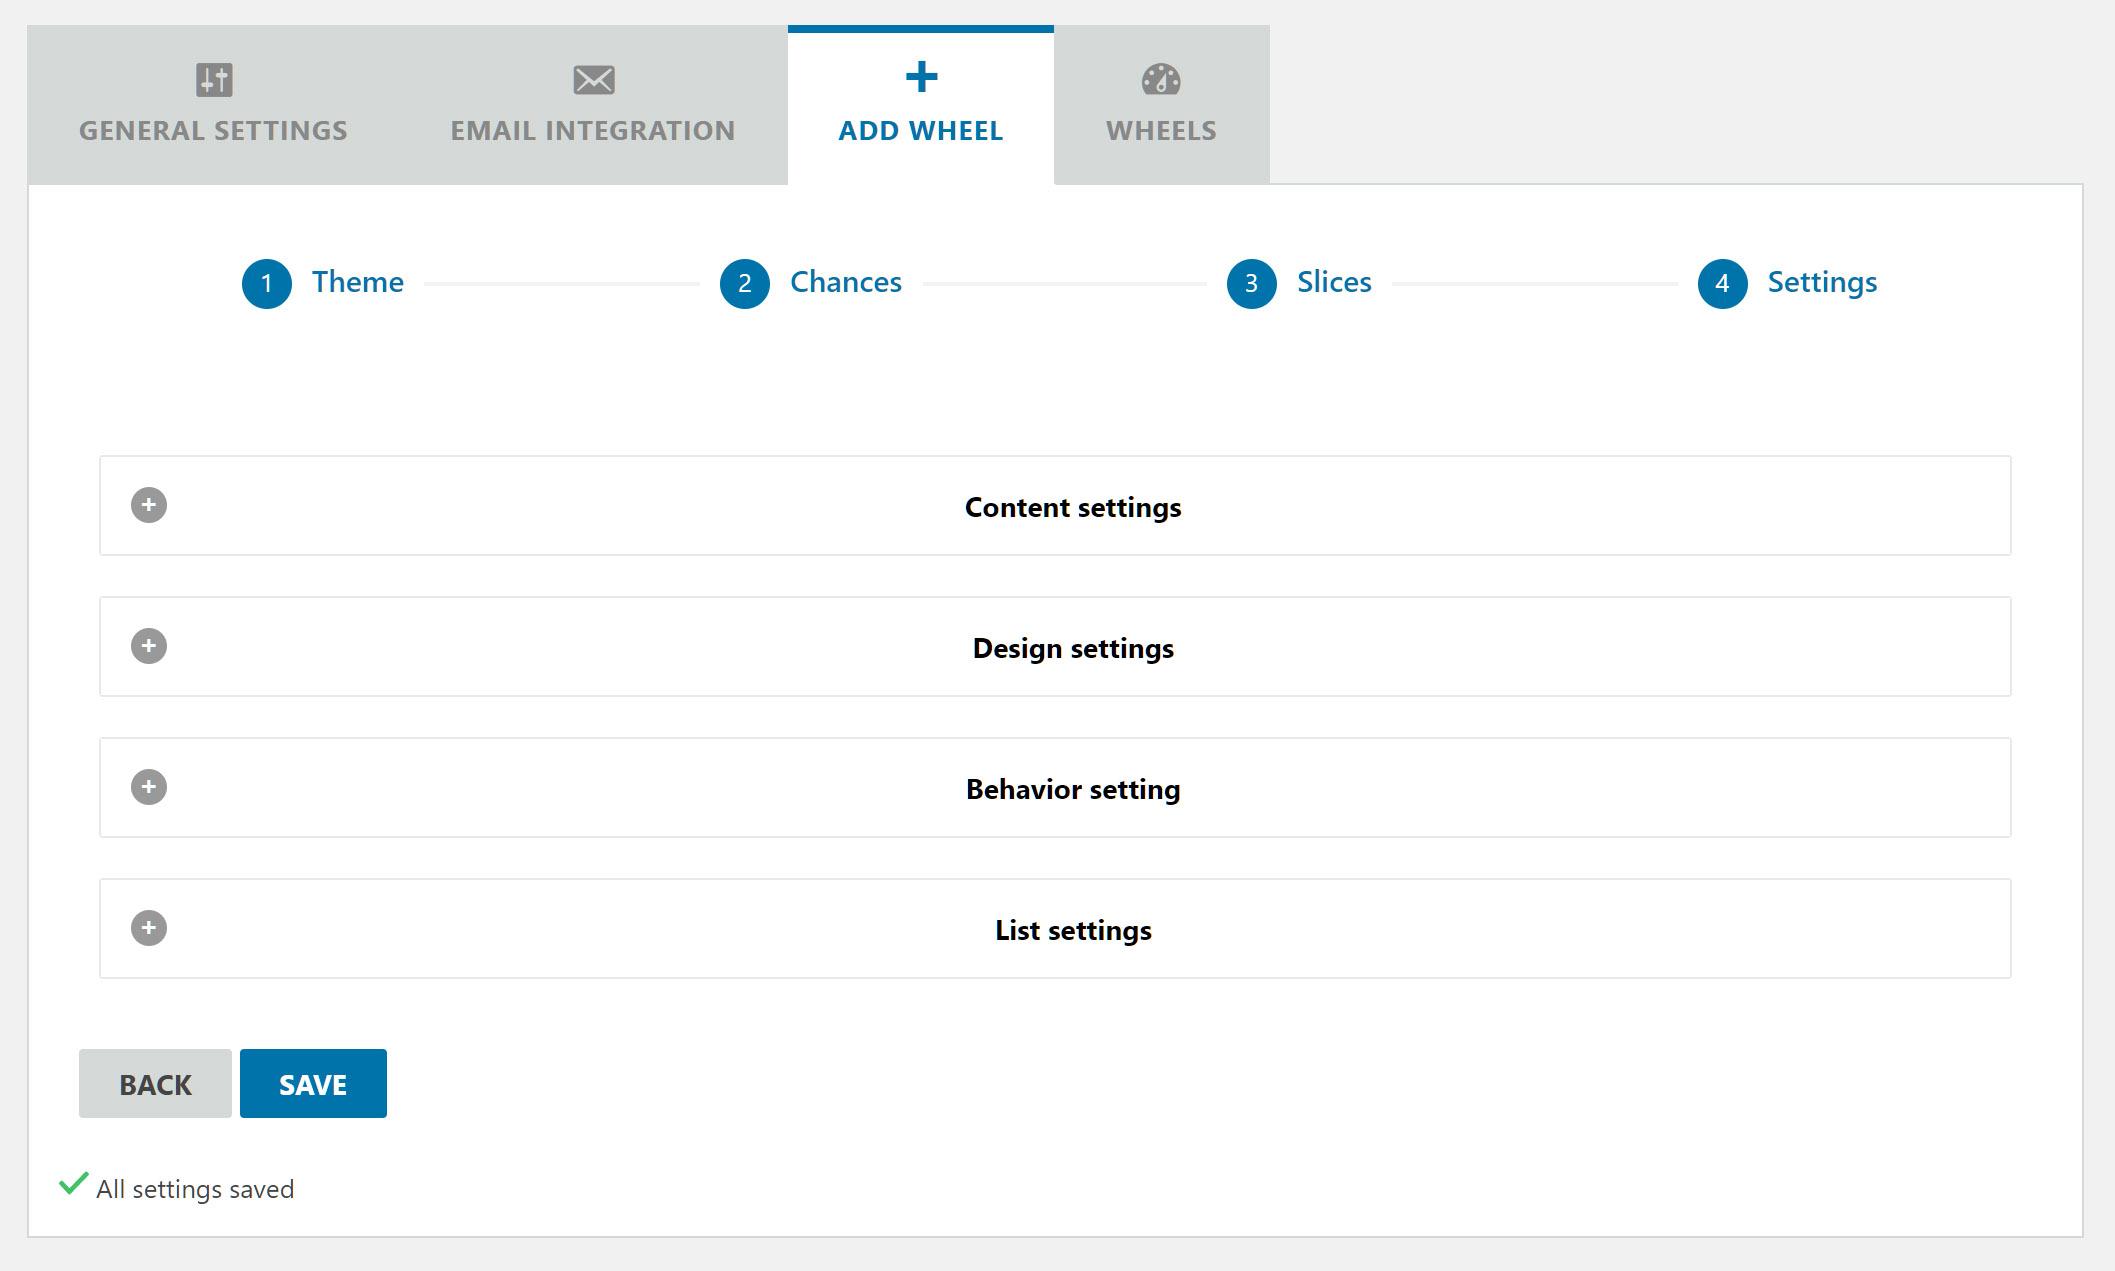 WP Optin Wheel – Gamified Optin Email Marketing Tool for